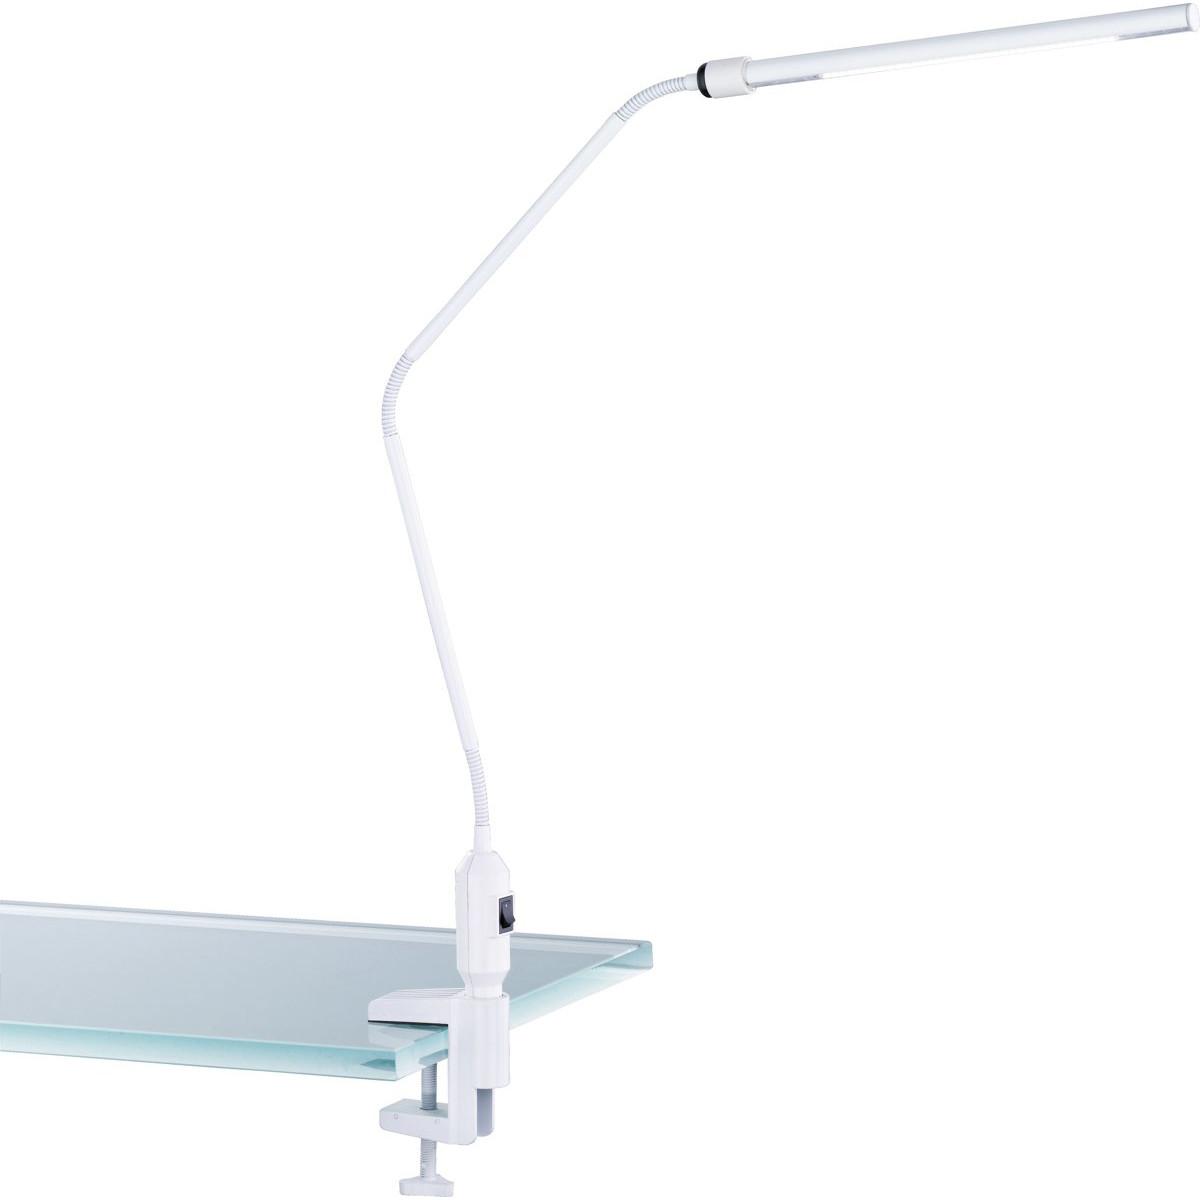 LED Klemlamp - Trion Vary - 3W - Warm Wit 3000K - Glans Wit - Aluminium